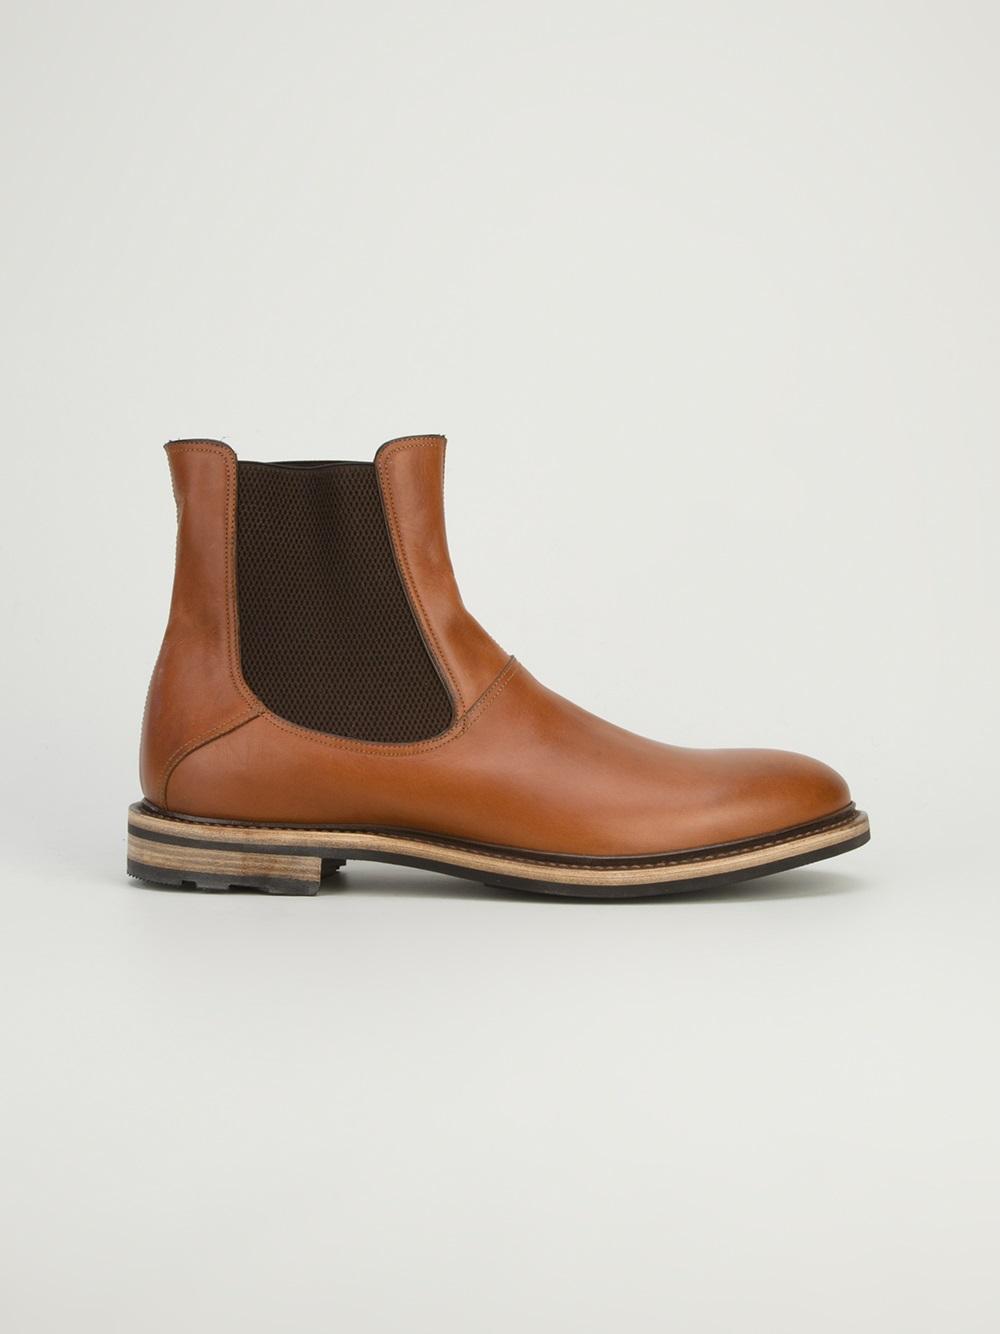 Lyst Fratelli Rossetti Chelsea Boot In Brown For Men